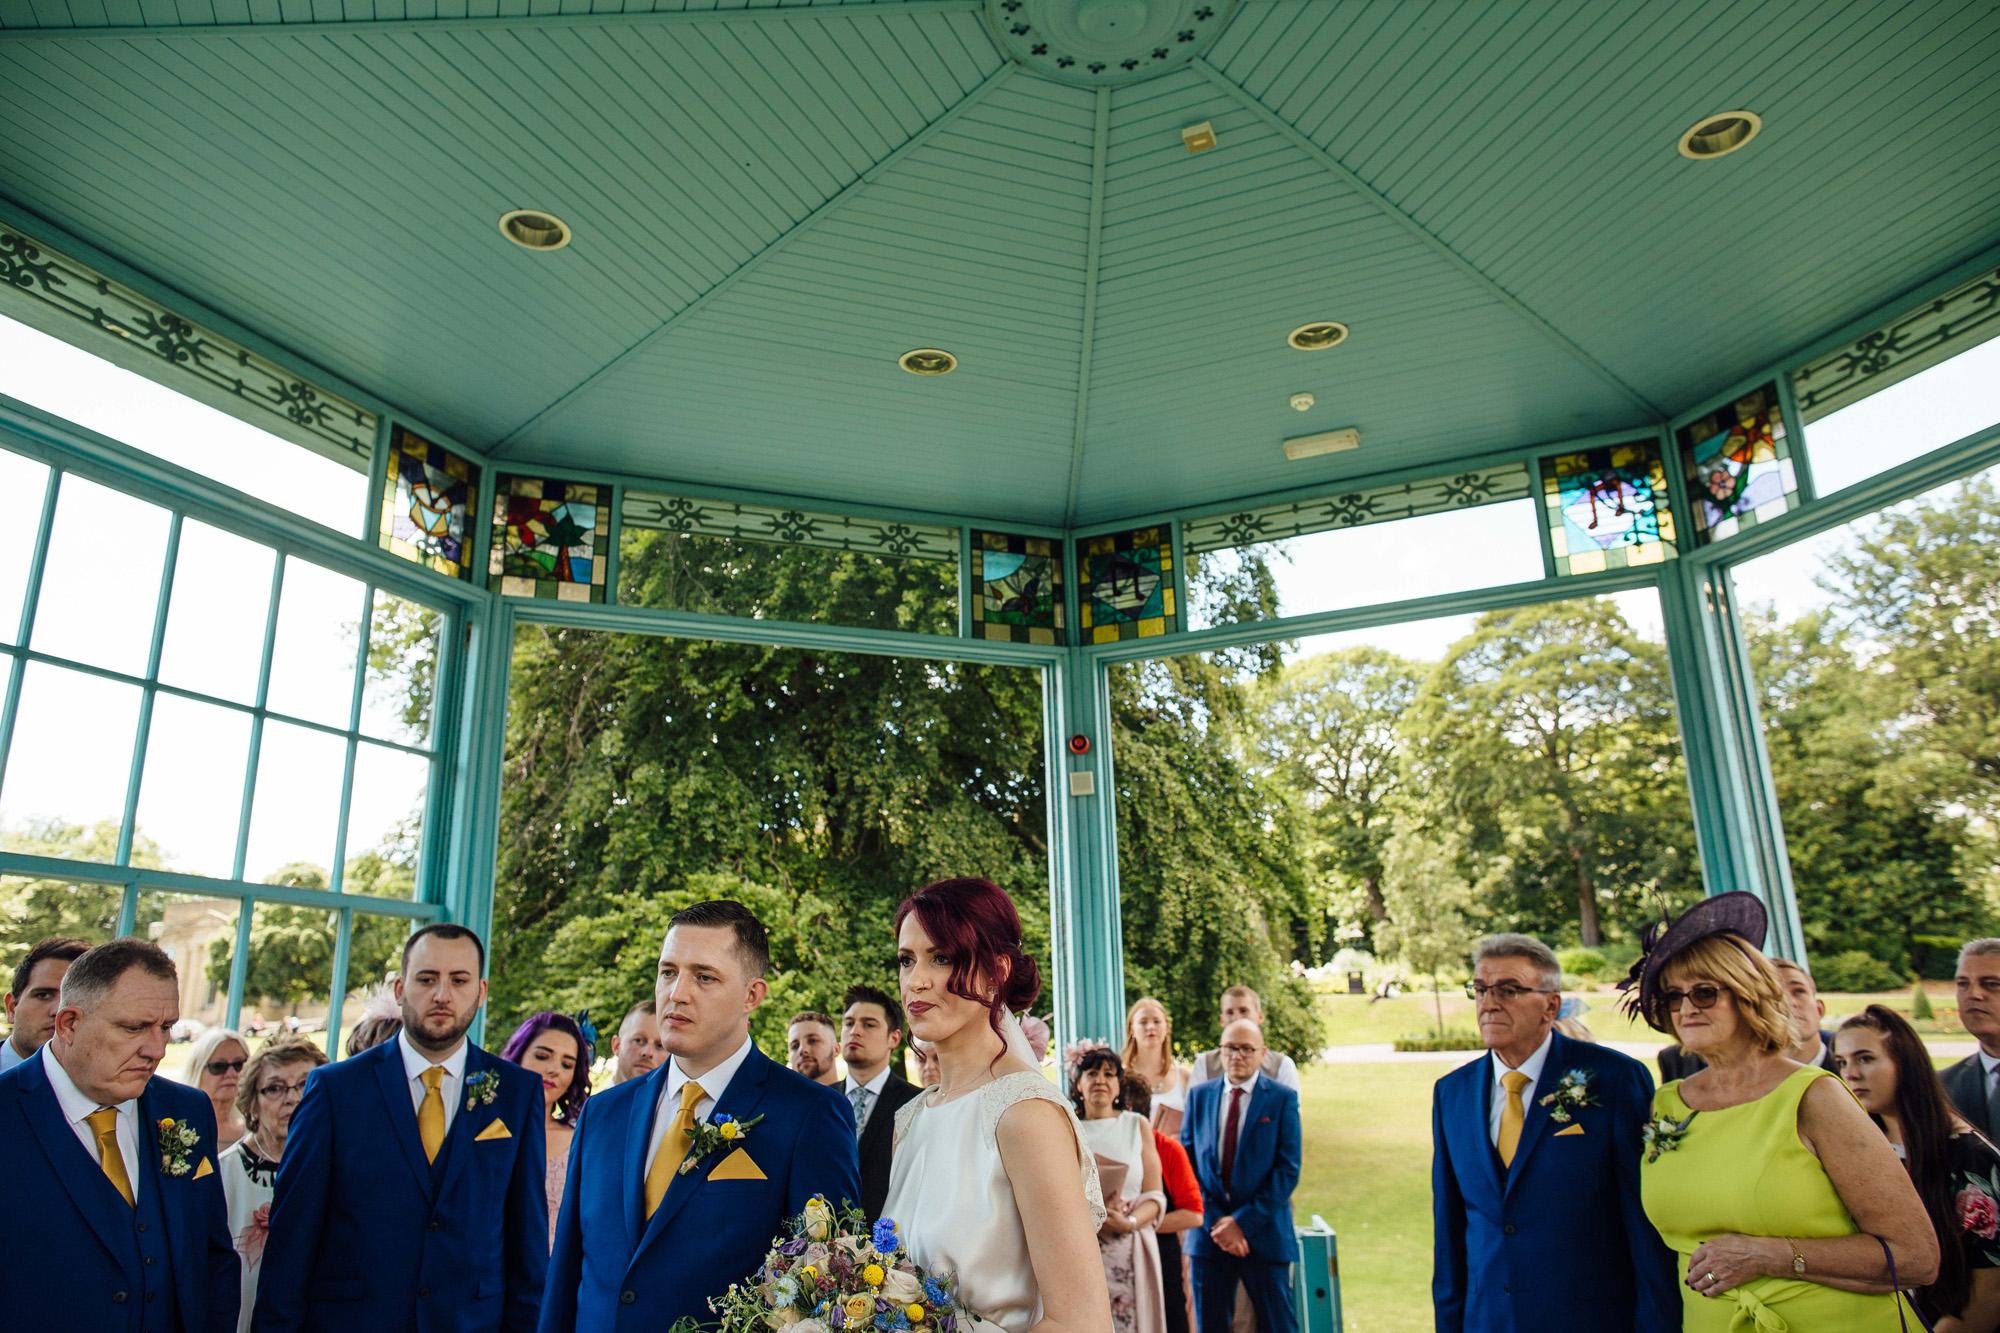 Sarah-Honeysuckle-Bias-Cut-Silk-Vintage-Inspired-Wedding-Gown-Sheffield-Wedding-Kate-Beaumont-14.jpg